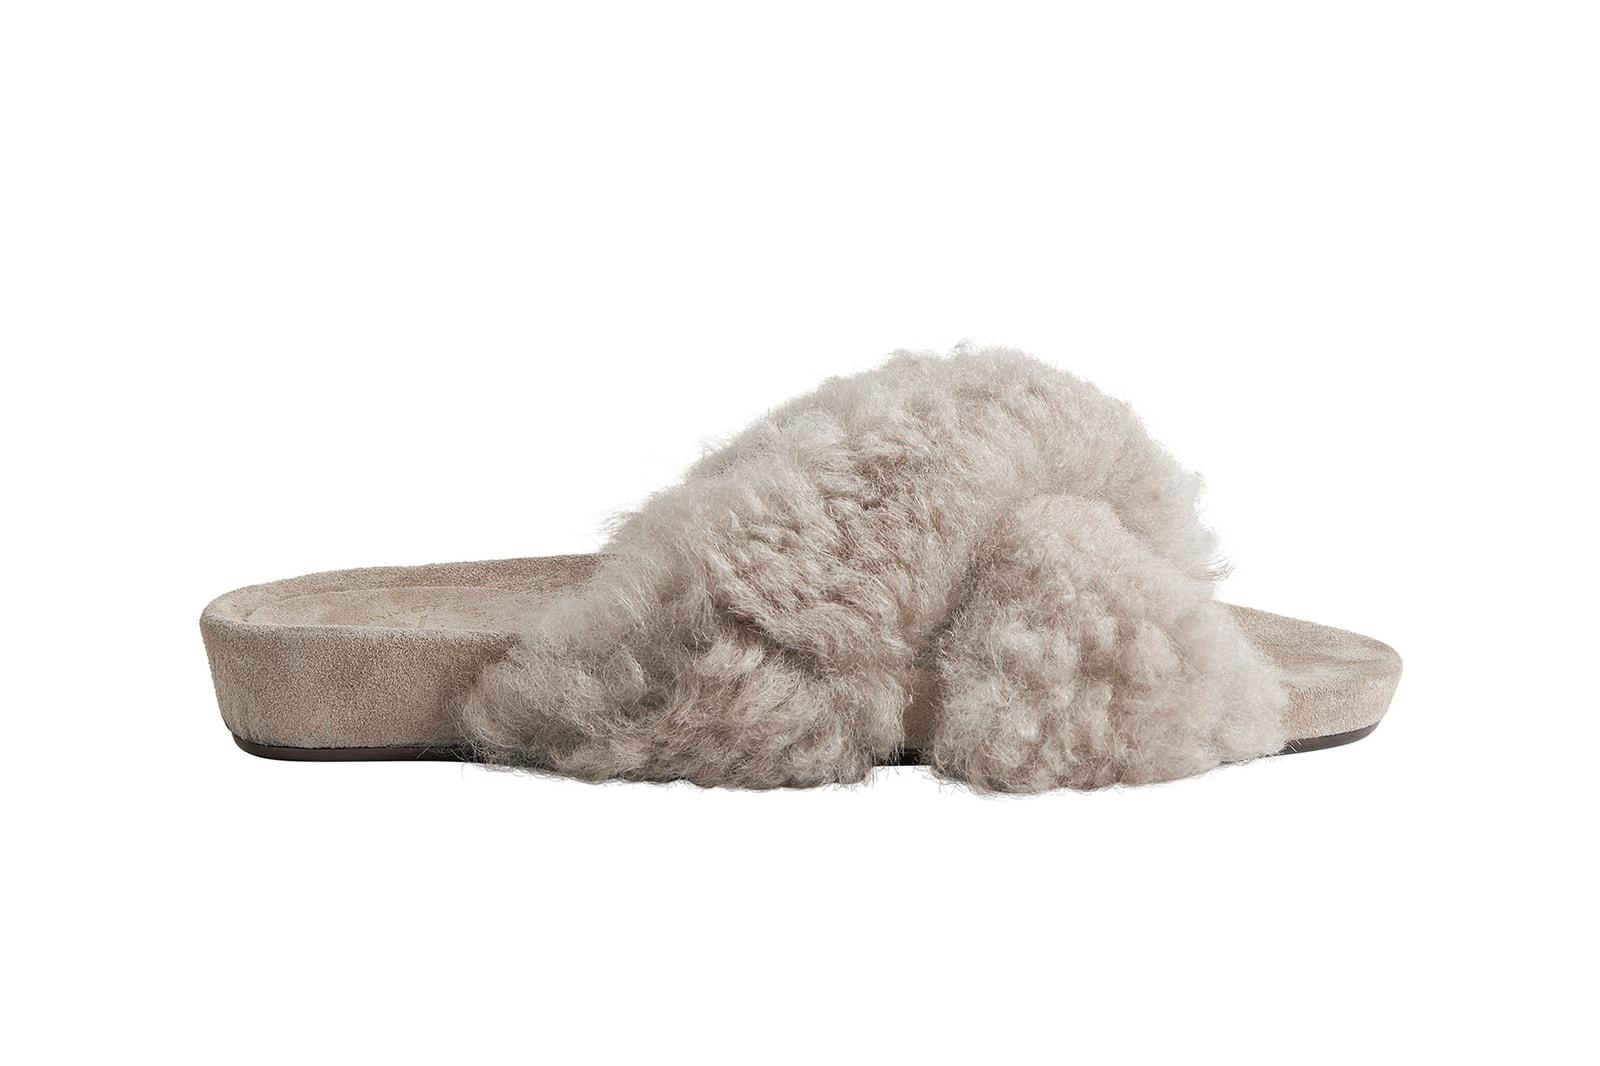 net a porter atp atelier collaboration doris everyday sandals shearling fur gray